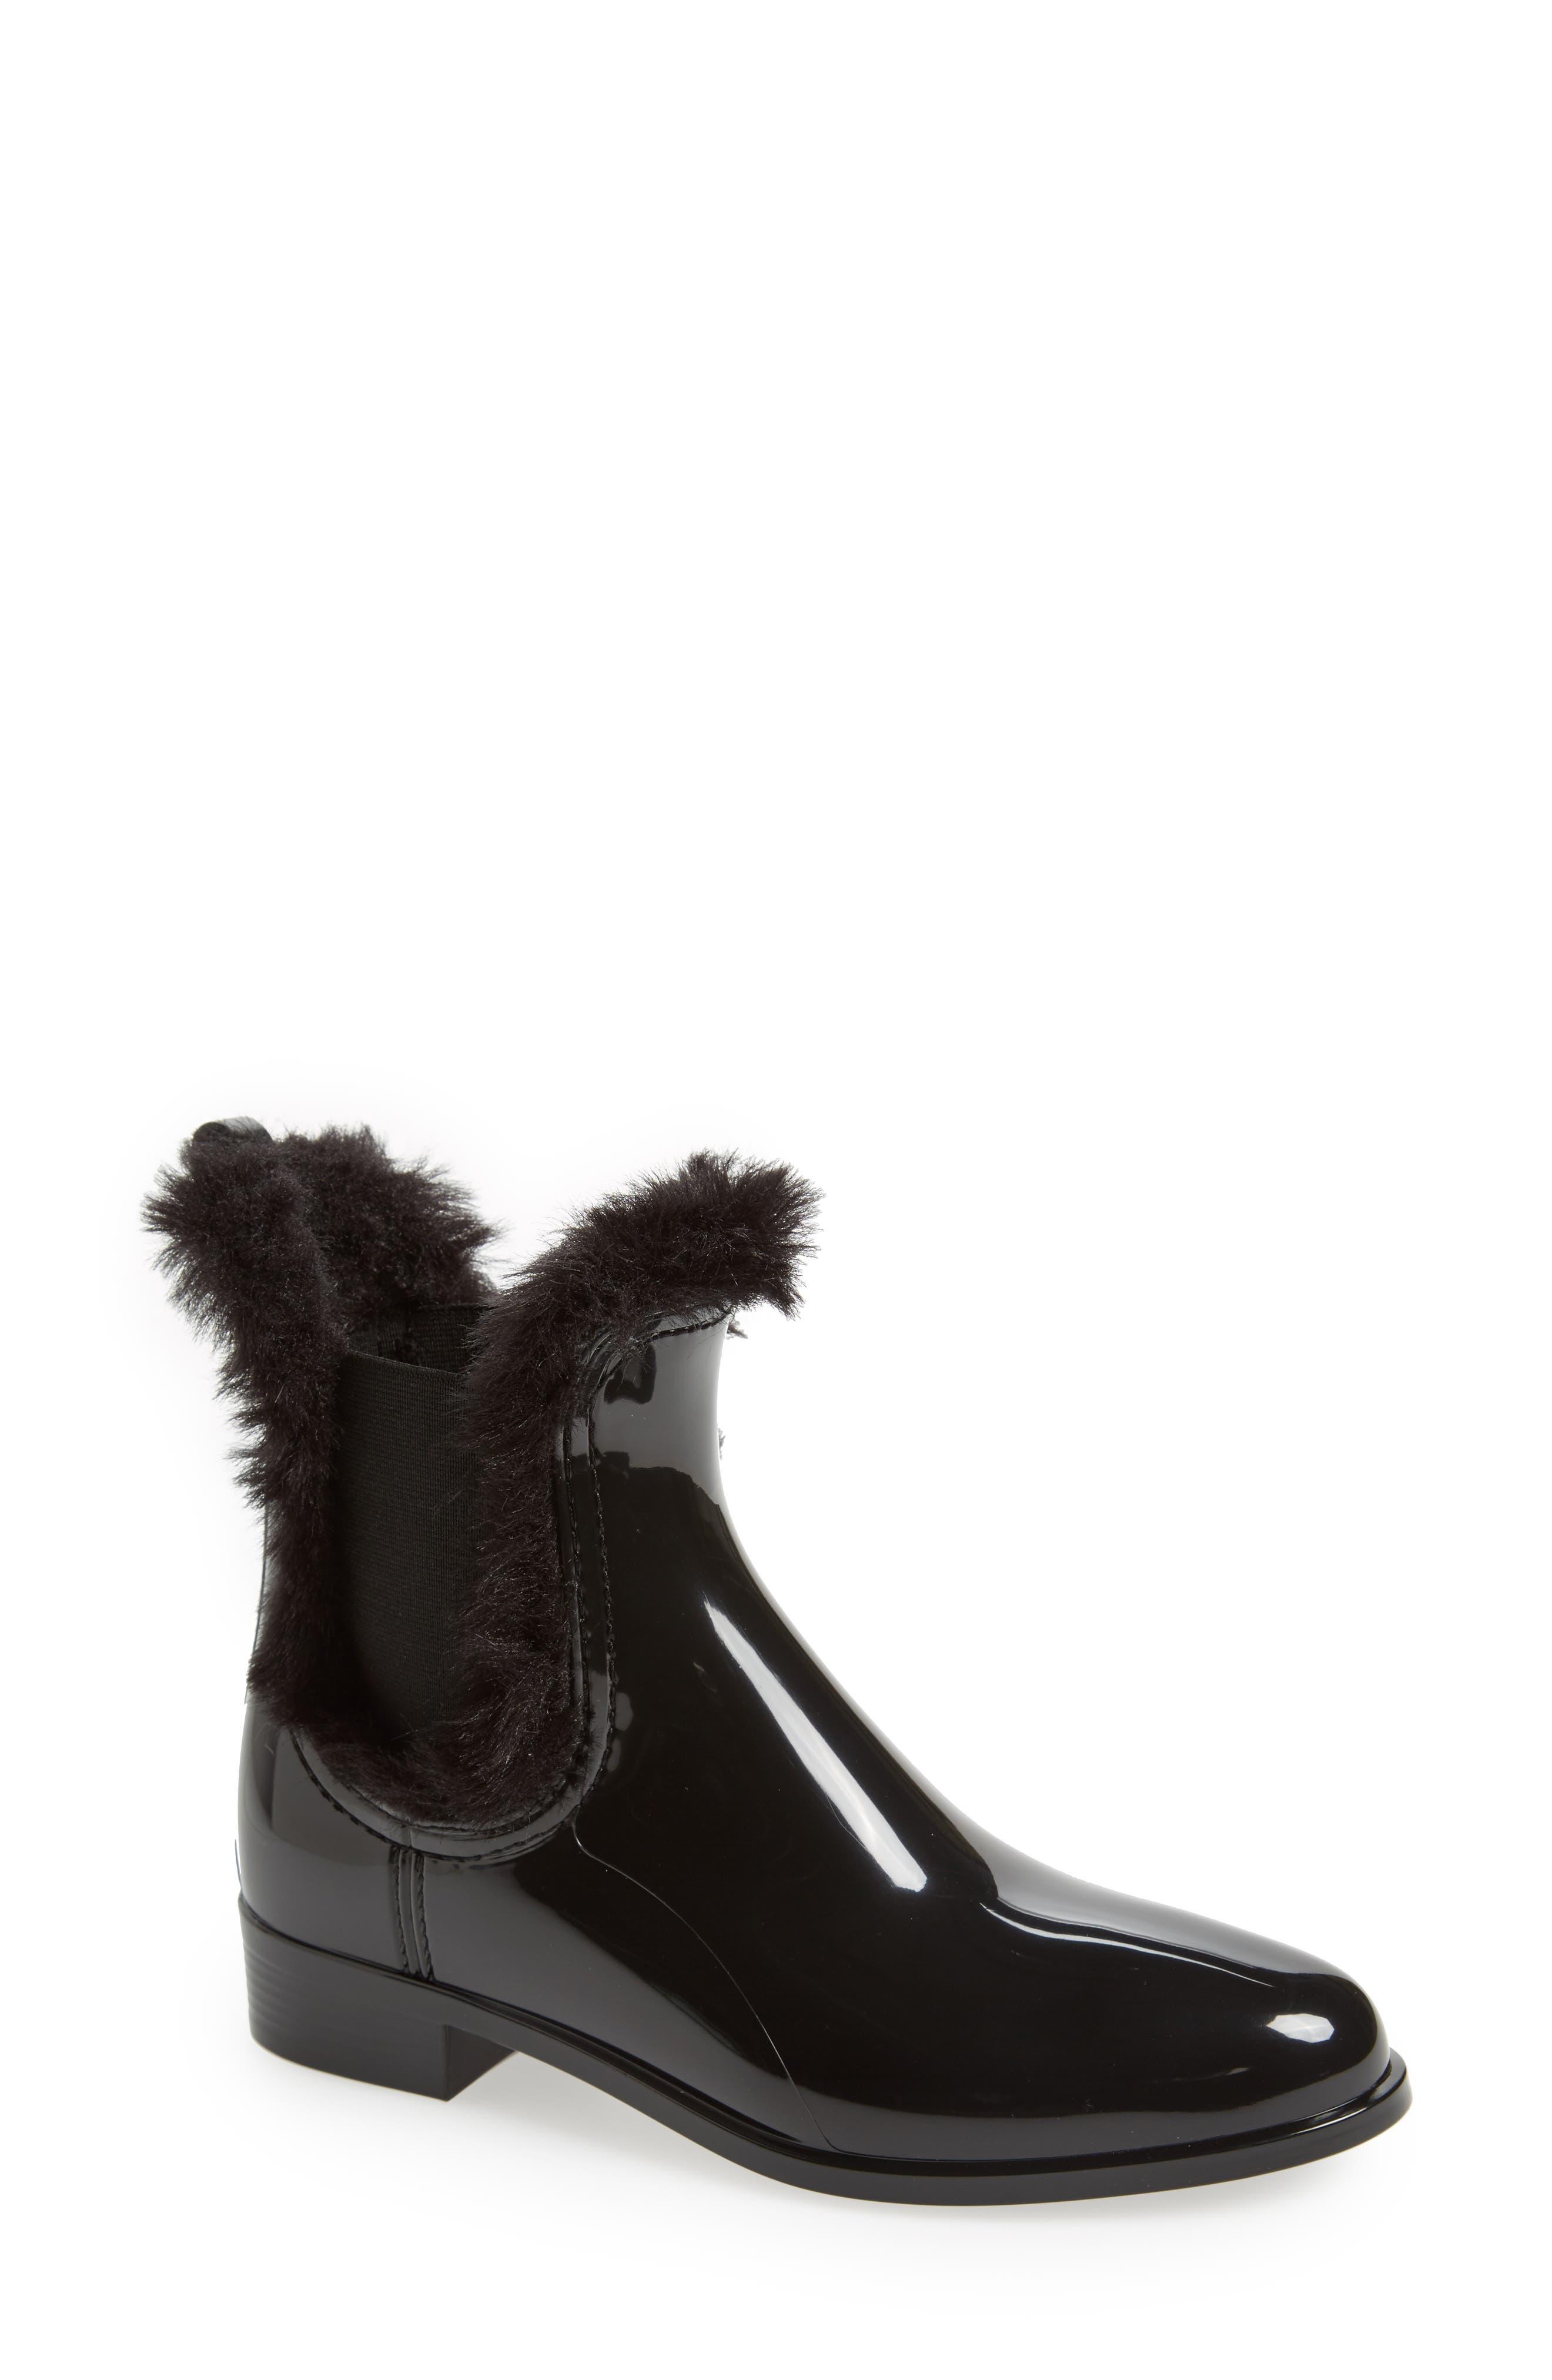 Lemon Jelly Aisha Waterproof Chelsea Boot with Faux Fur Lining (Women)